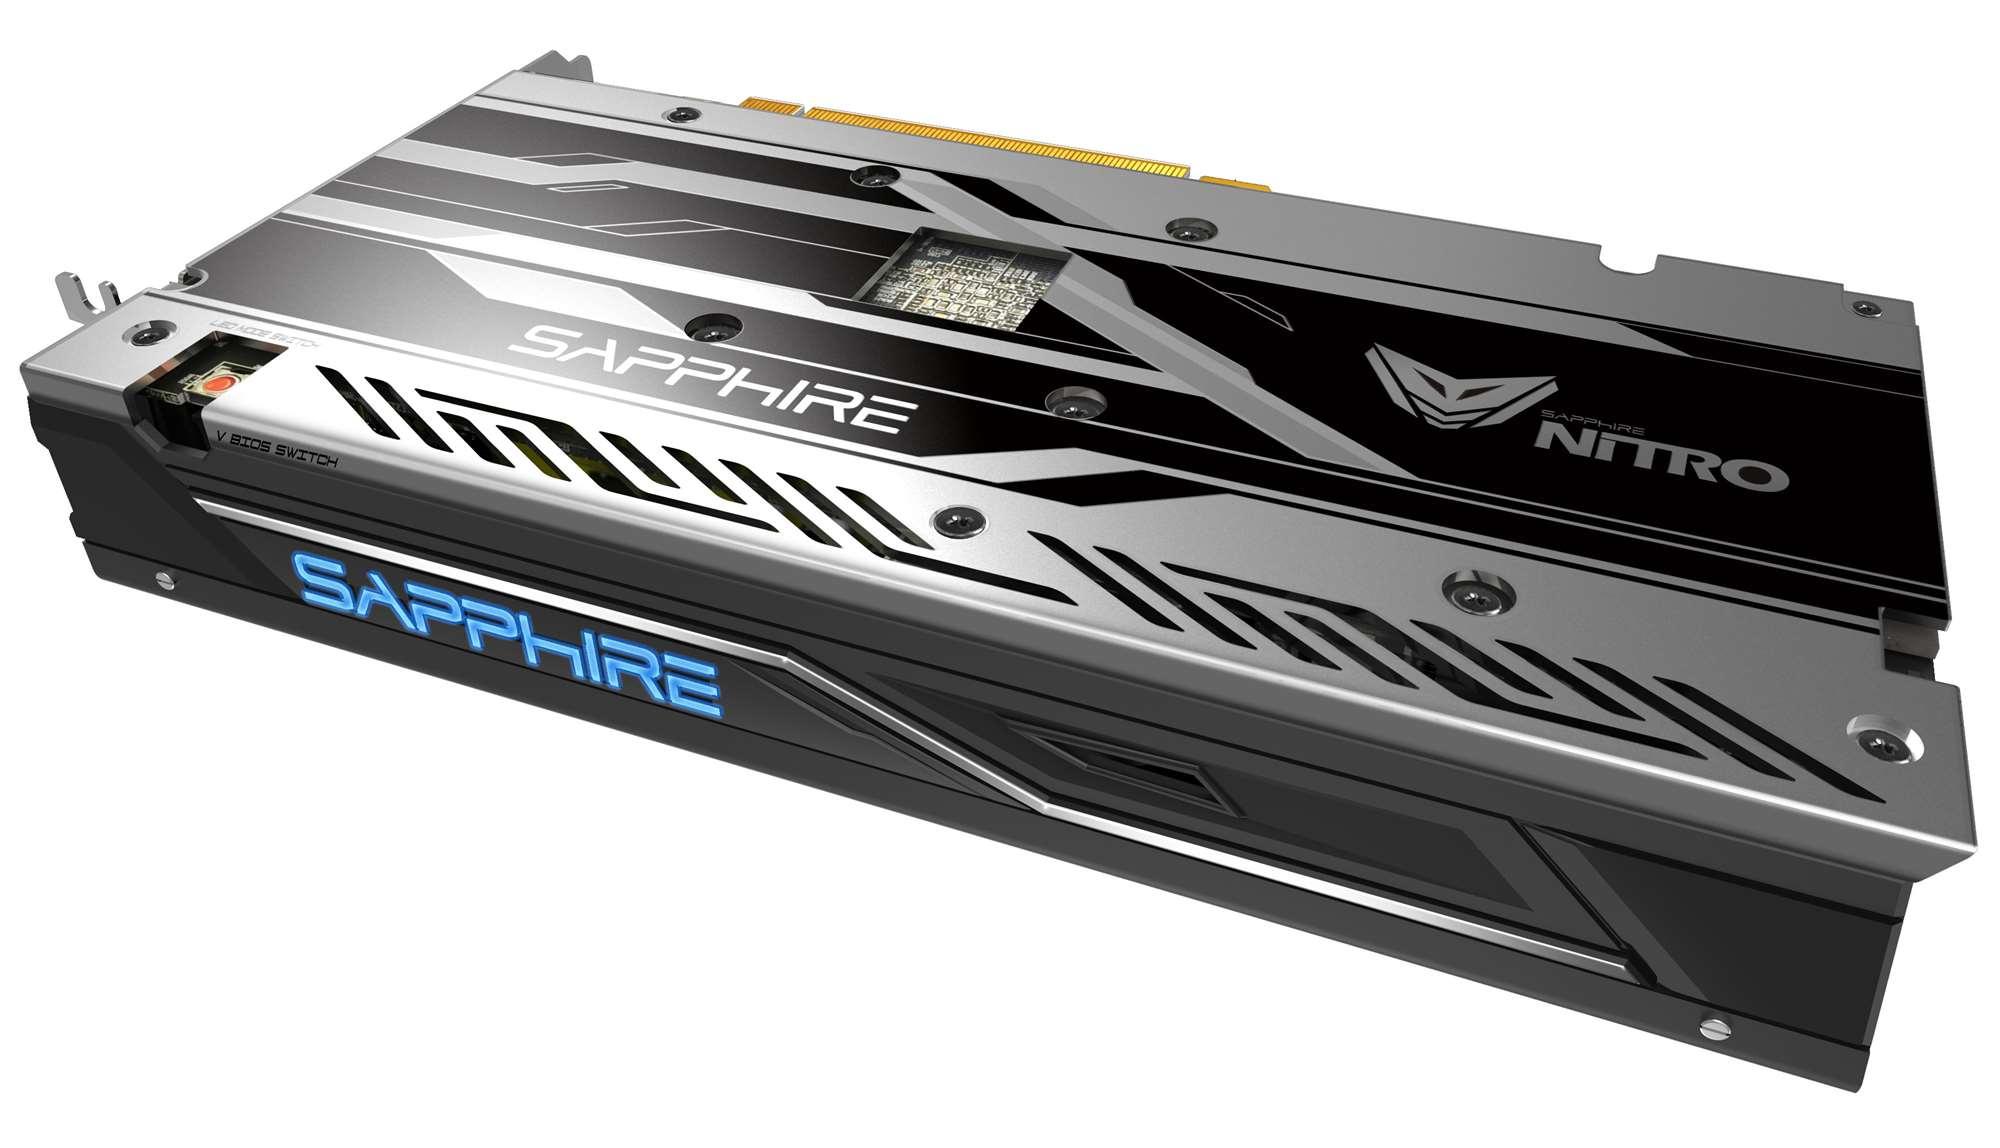 Sapphire Radeon RX 480 Nitro benchmarked | IGN Boards